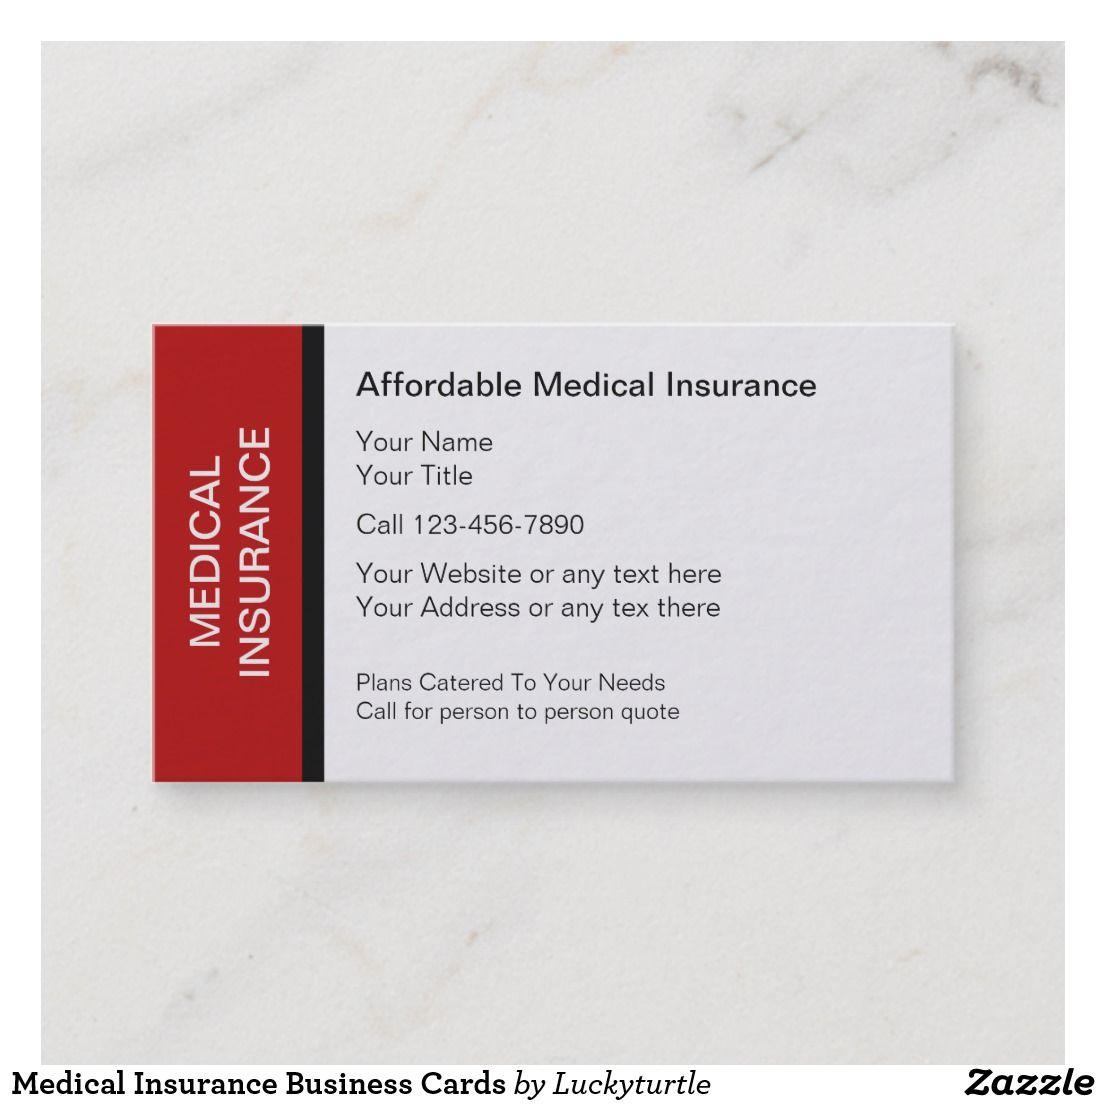 Medical Insurance Business Cards Zazzle Com